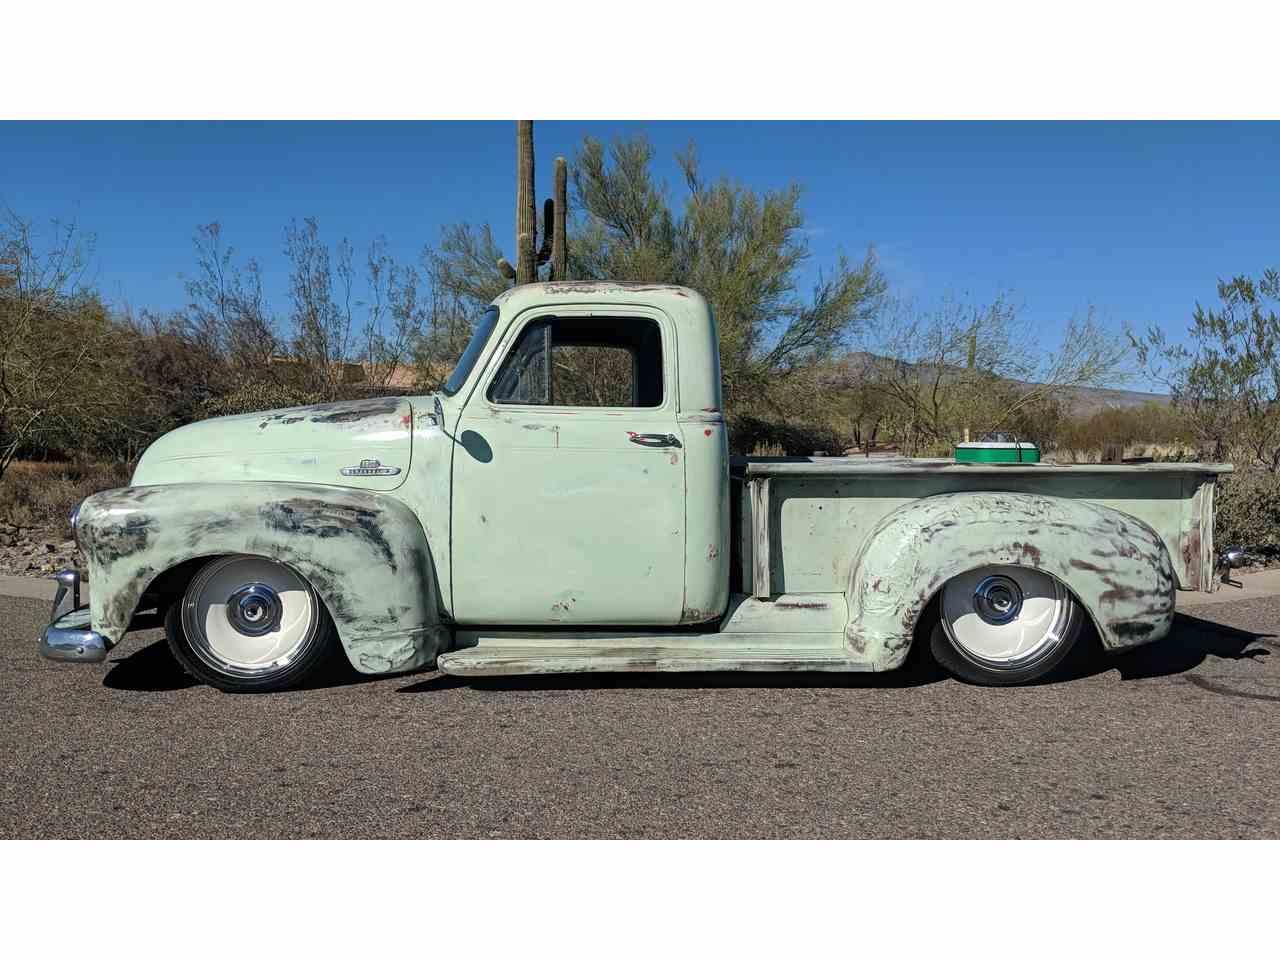 1955 Chevrolet Rat Rod Truck for Sale | ClassicCars.com | CC-1056357